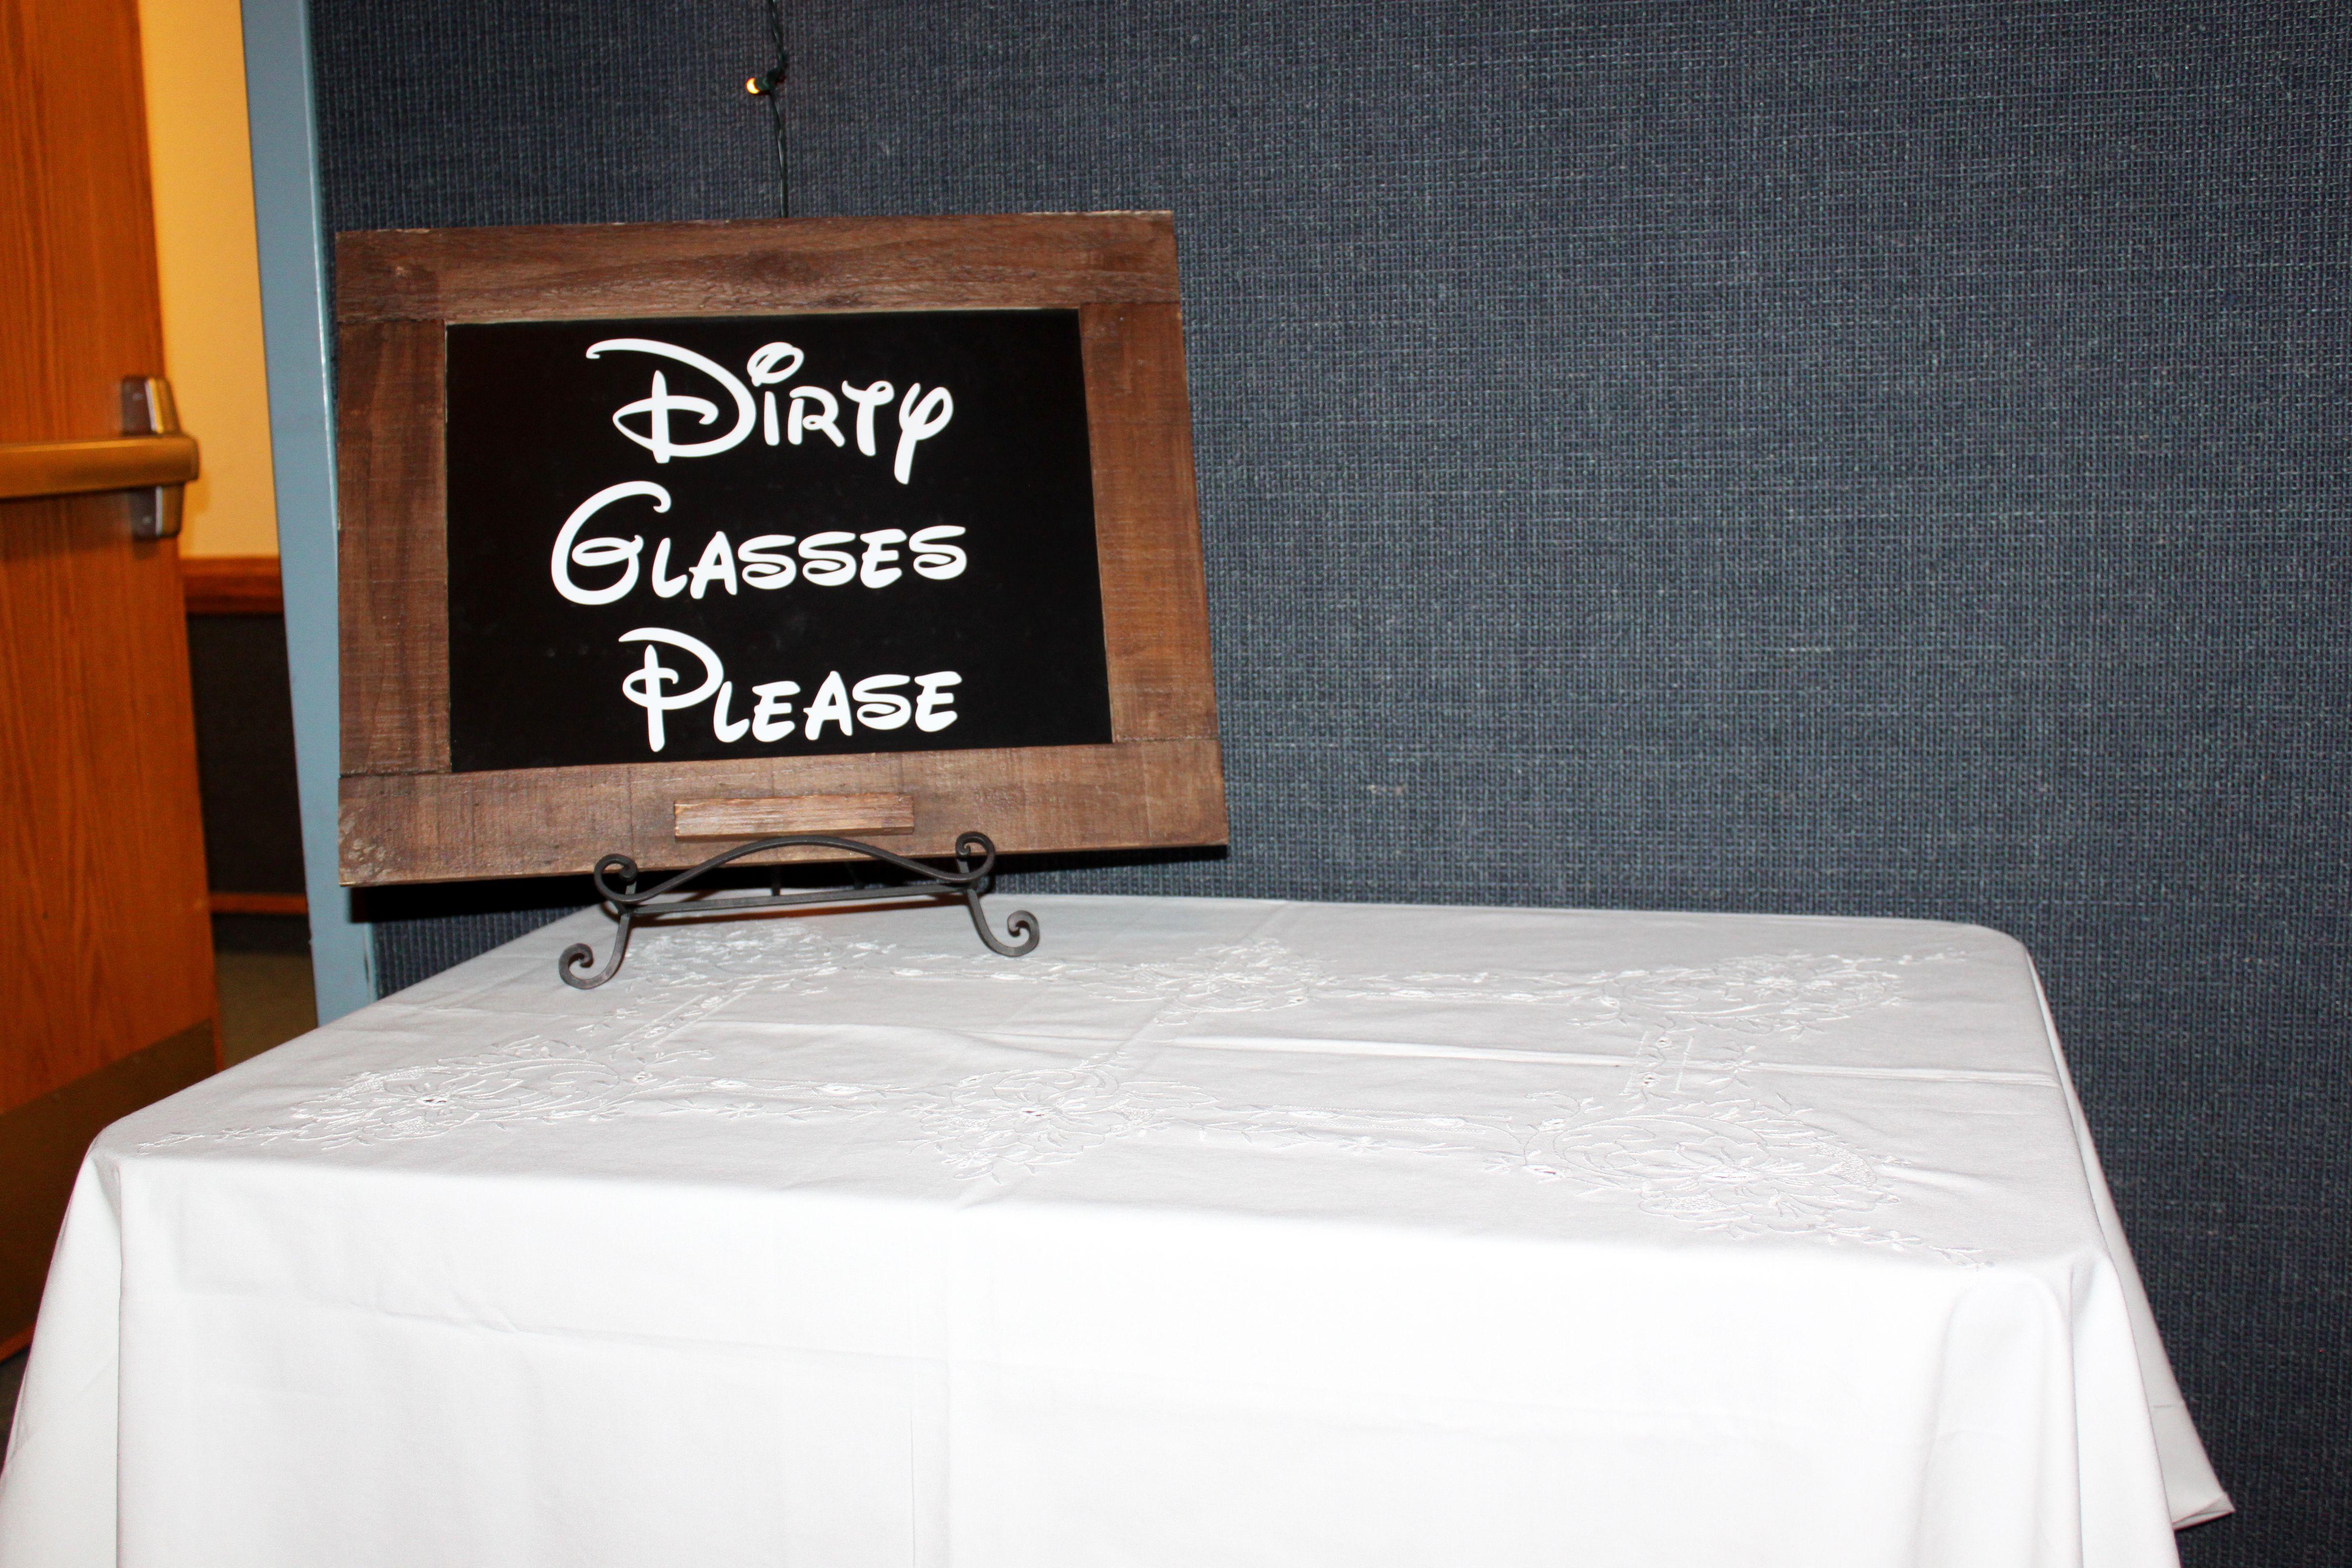 Dirt Glasses